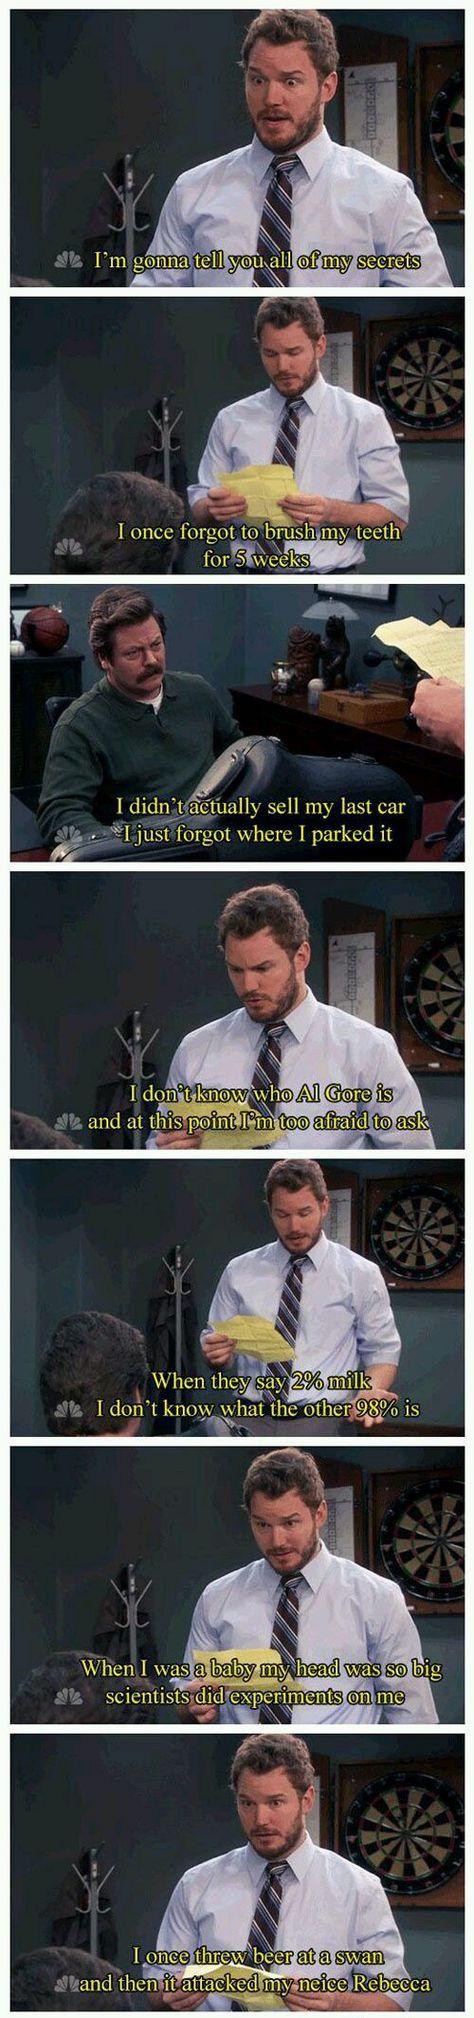 Chris Pratt's secrets (Parks & Rec)